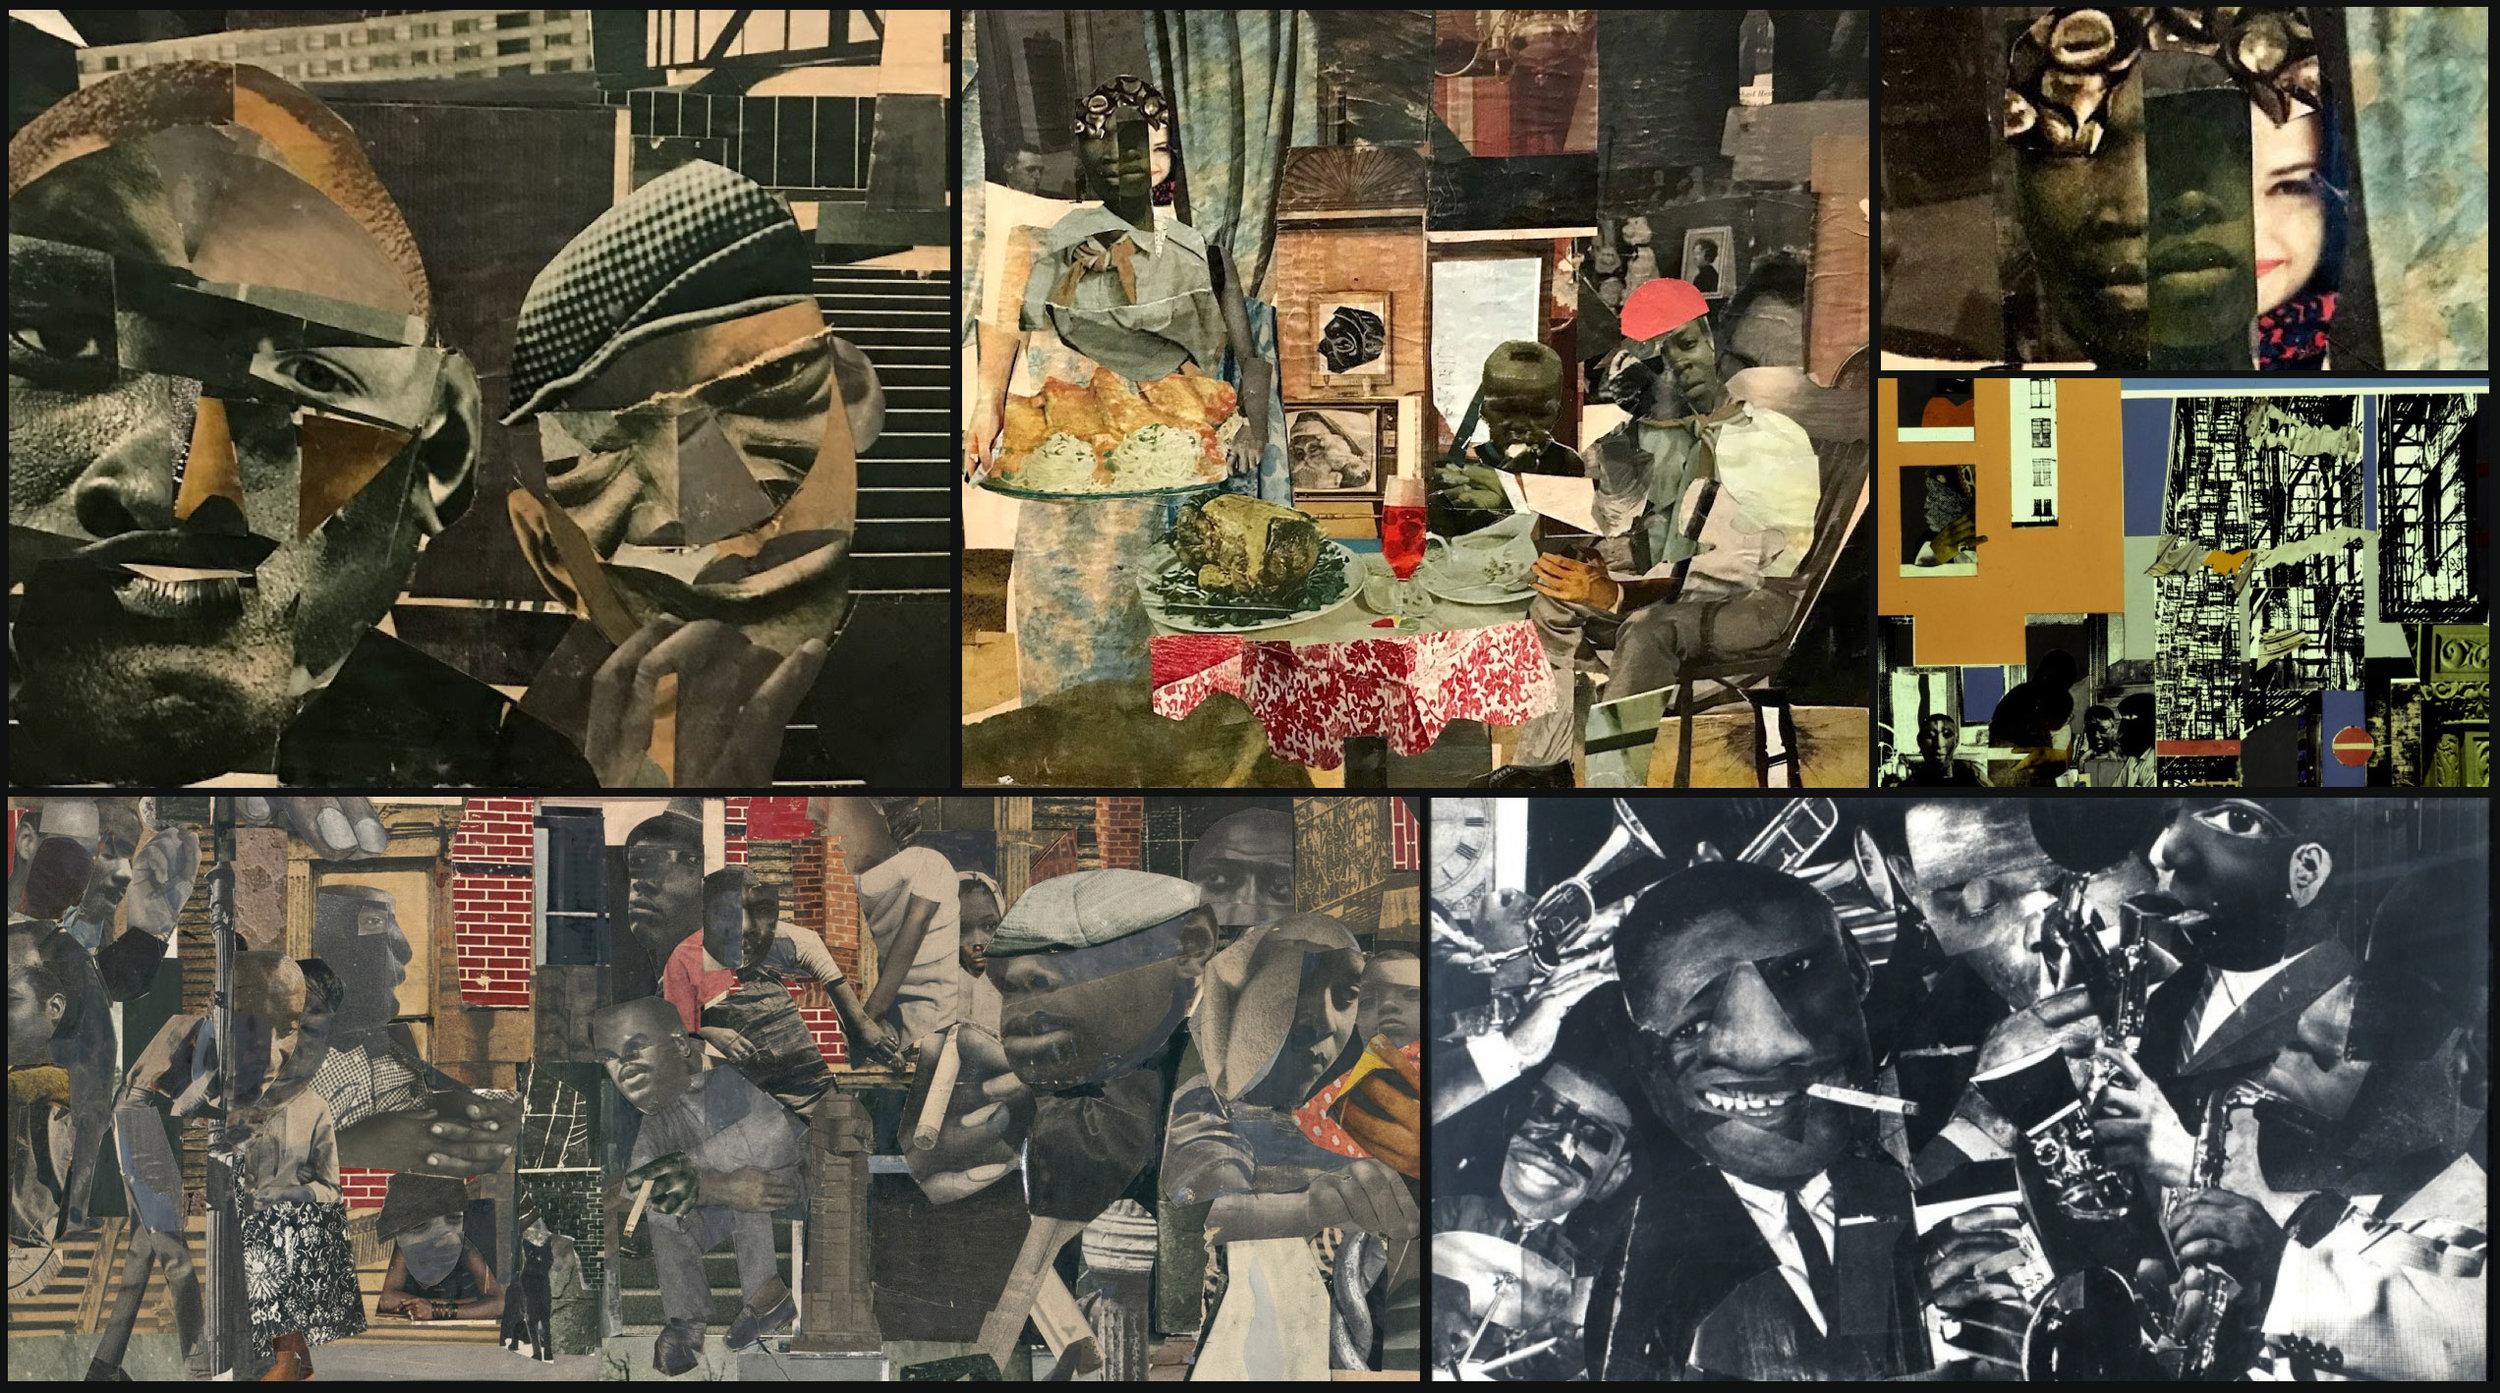 Inspiration - The collage art of Romare Bearden